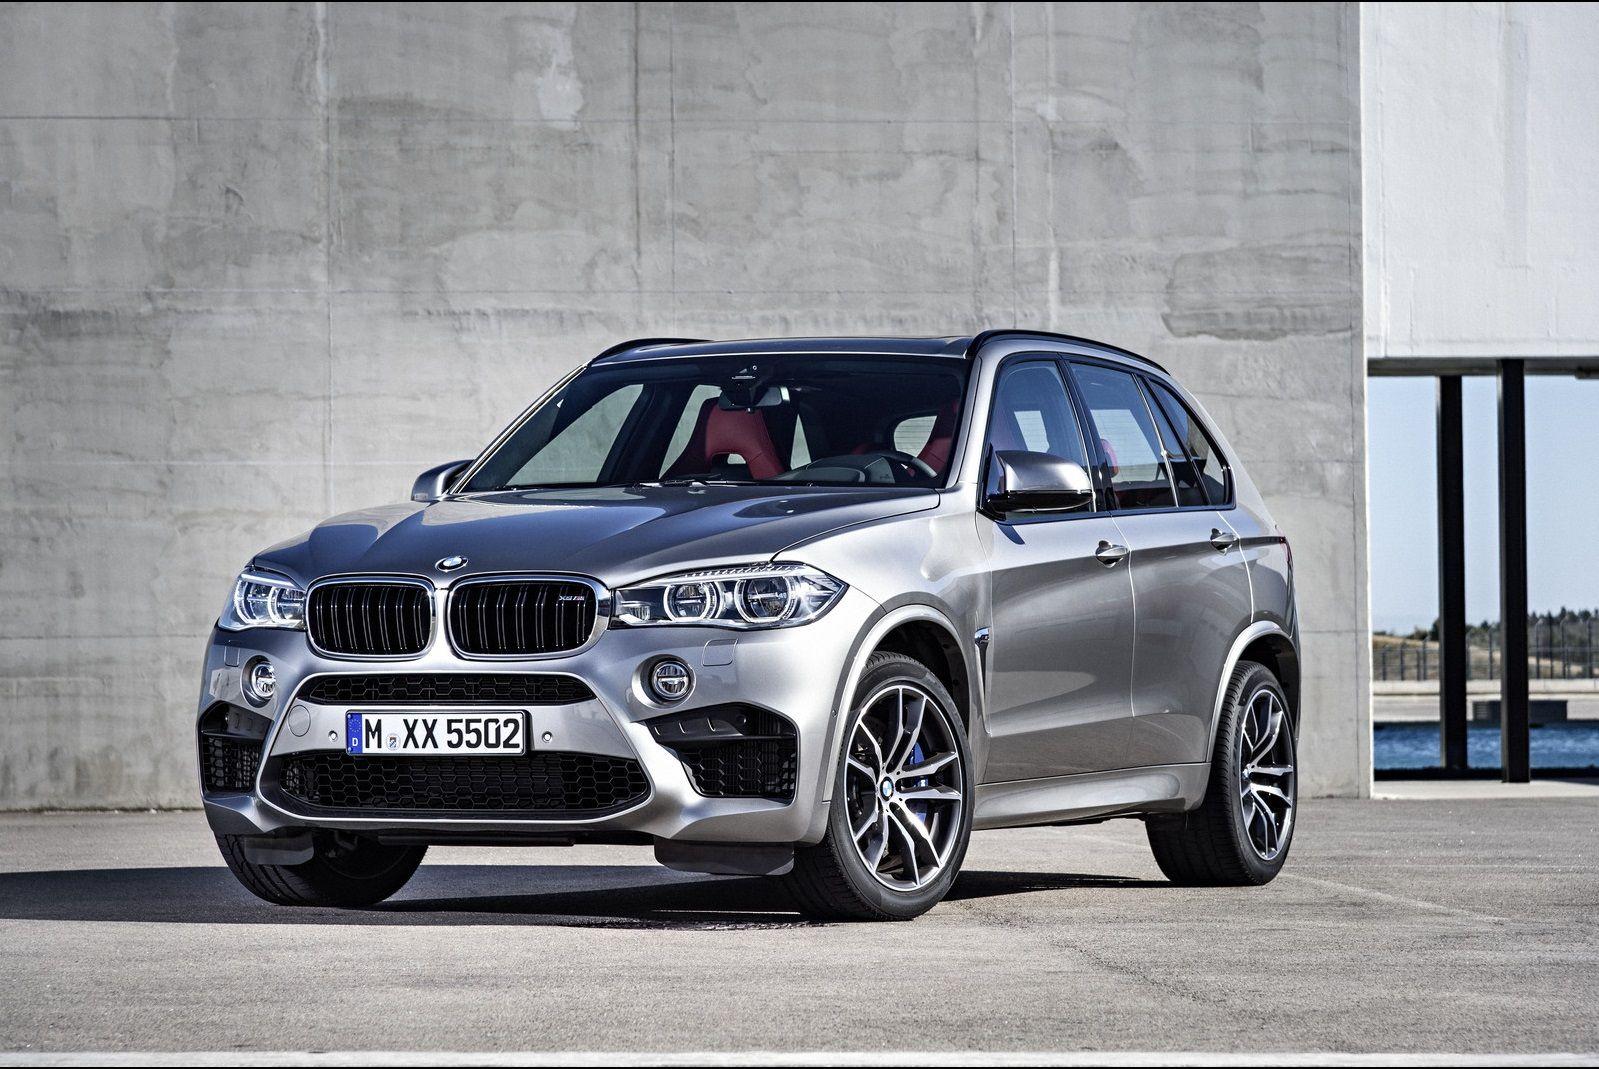 2018 bmw x5 changes interior release date http newautocarhq